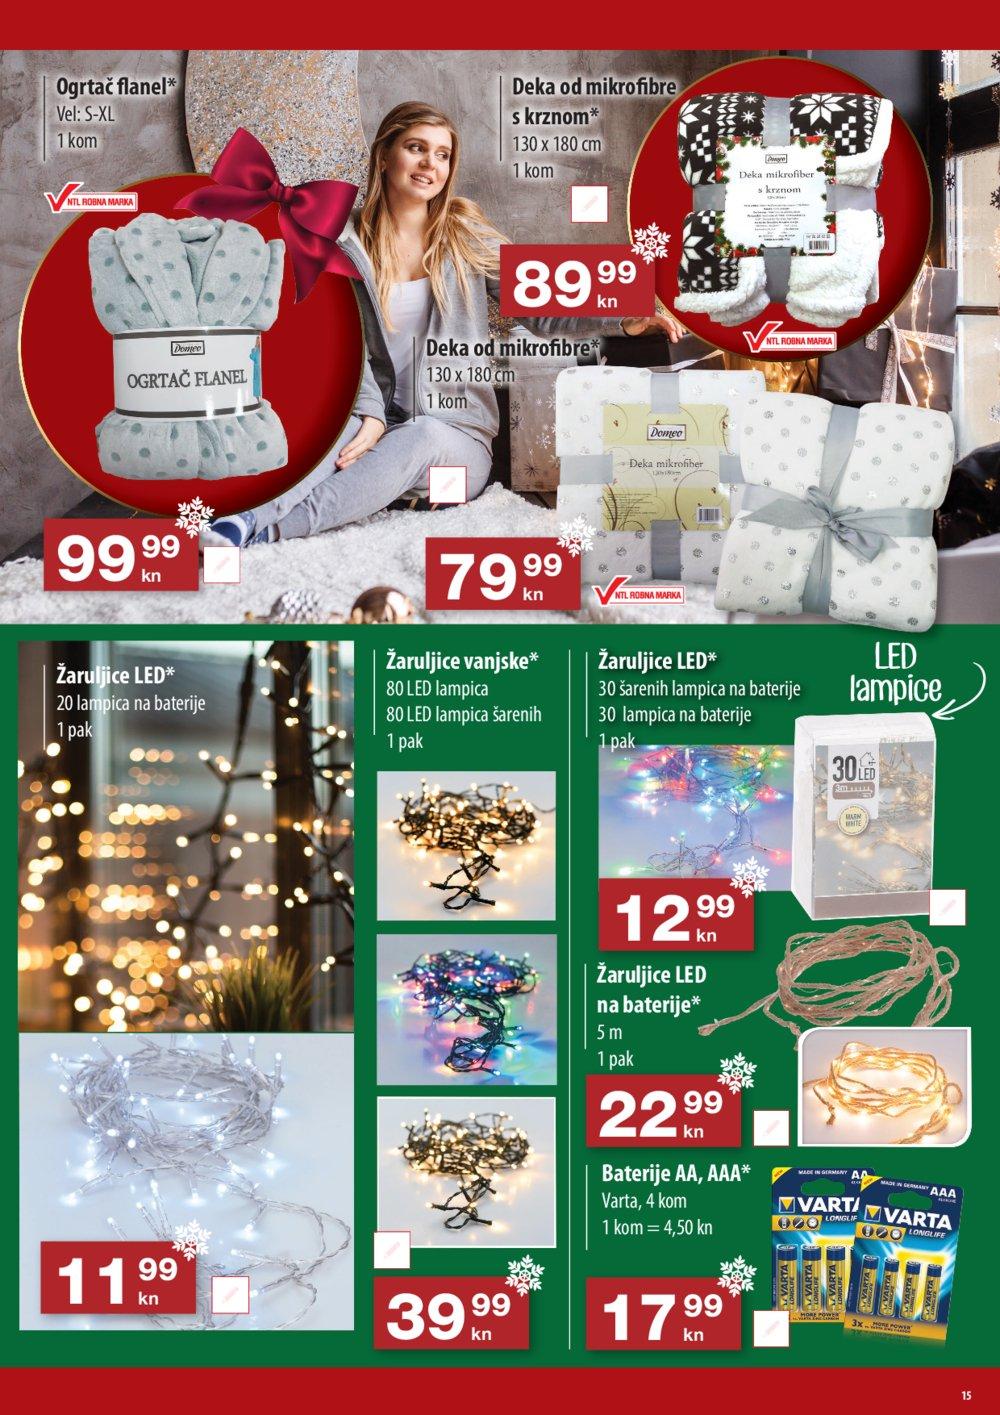 Trgovina Krk katalog NTL Maxi Tjedna ponuda 03.12.-09.12.2020.